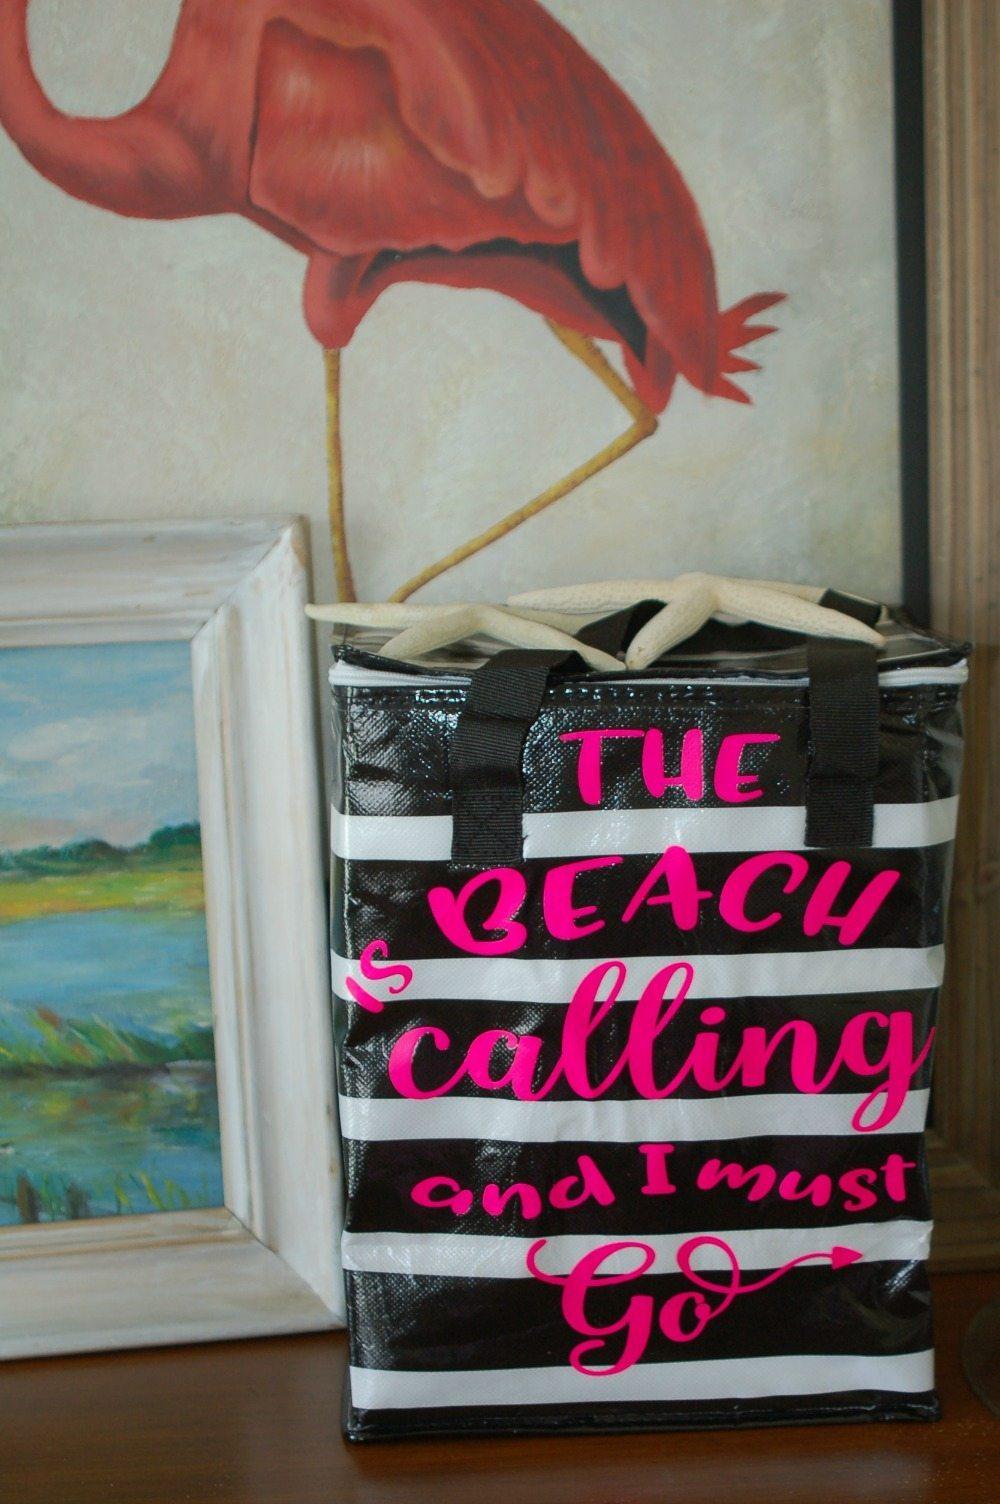 the beach is always calling my name love this insulated beach bag idea